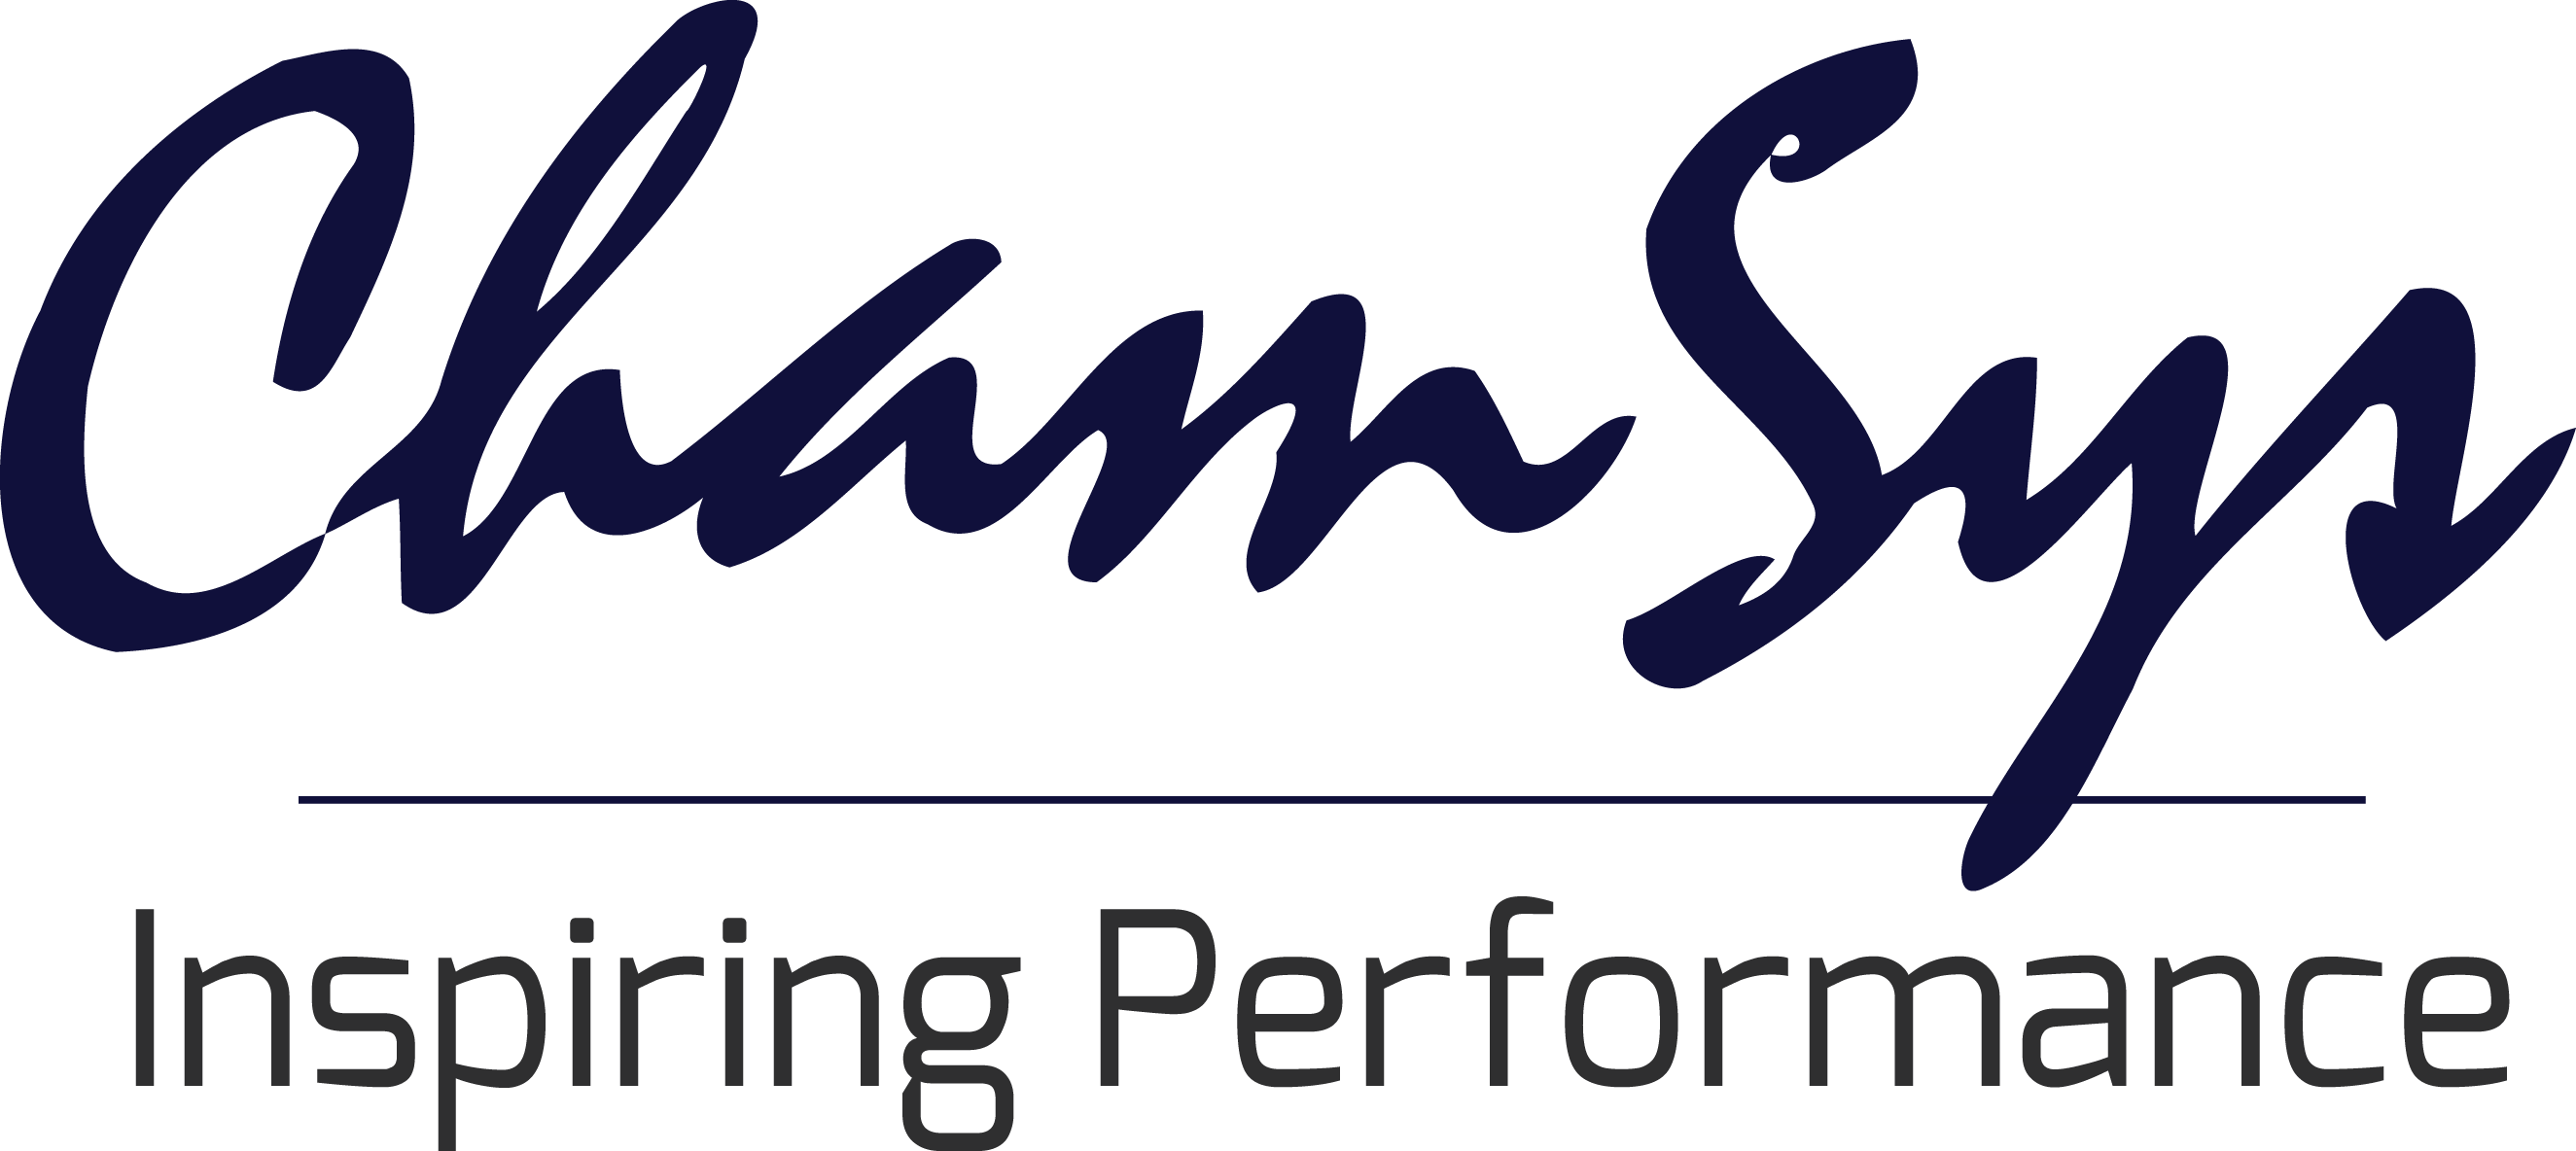 ChamSys-Logo-1